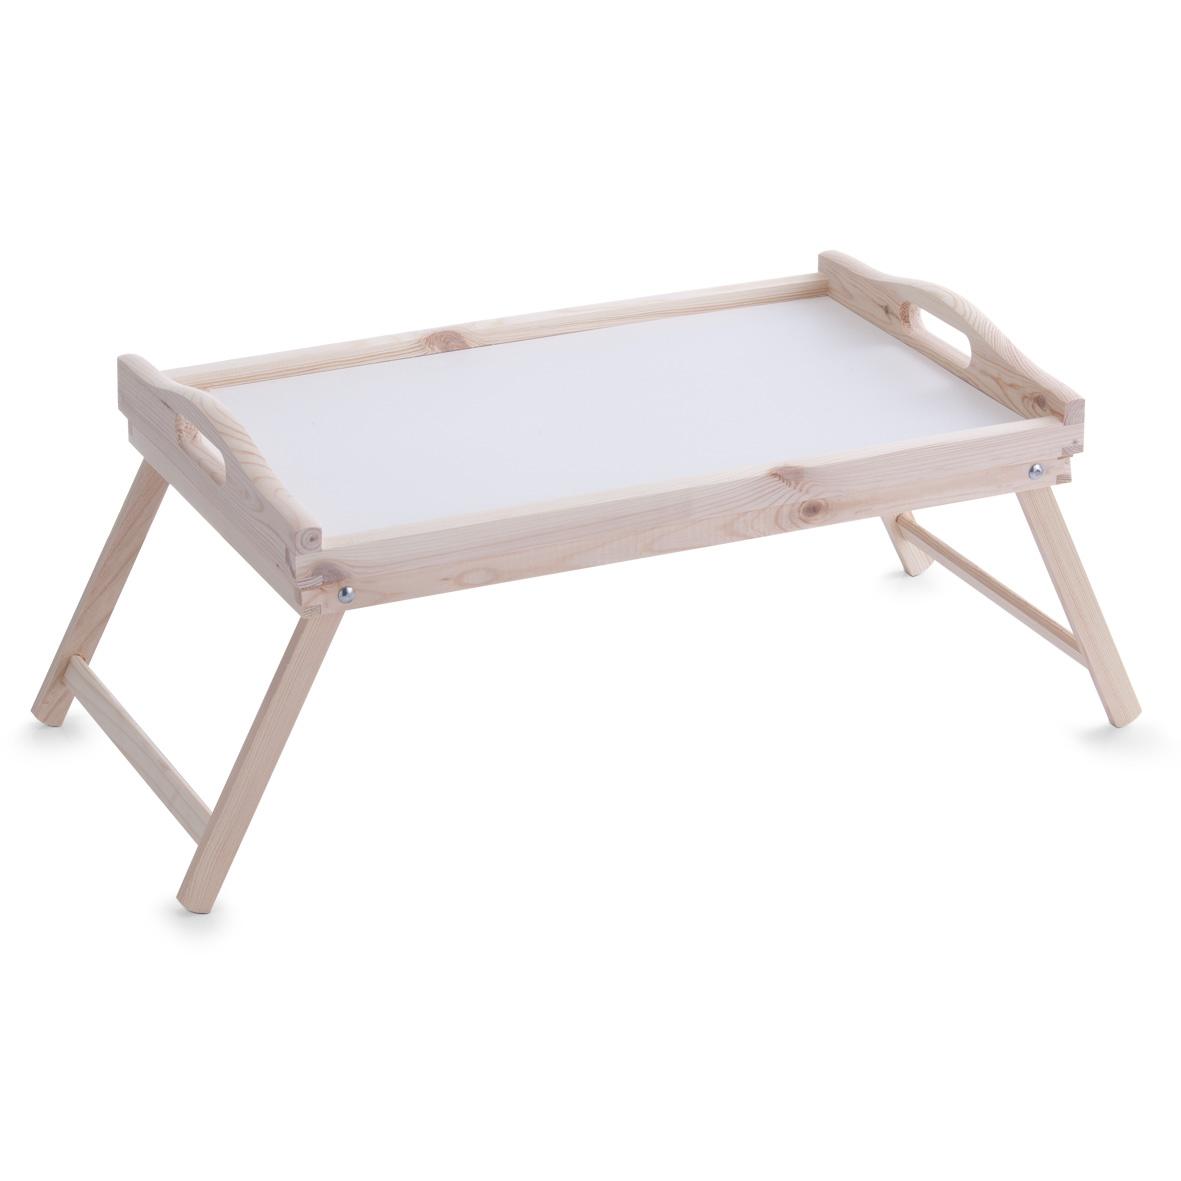 Masuta pliabila servire pat, Natural, din lemn de pin, L50xl30xH24,5 cm poza